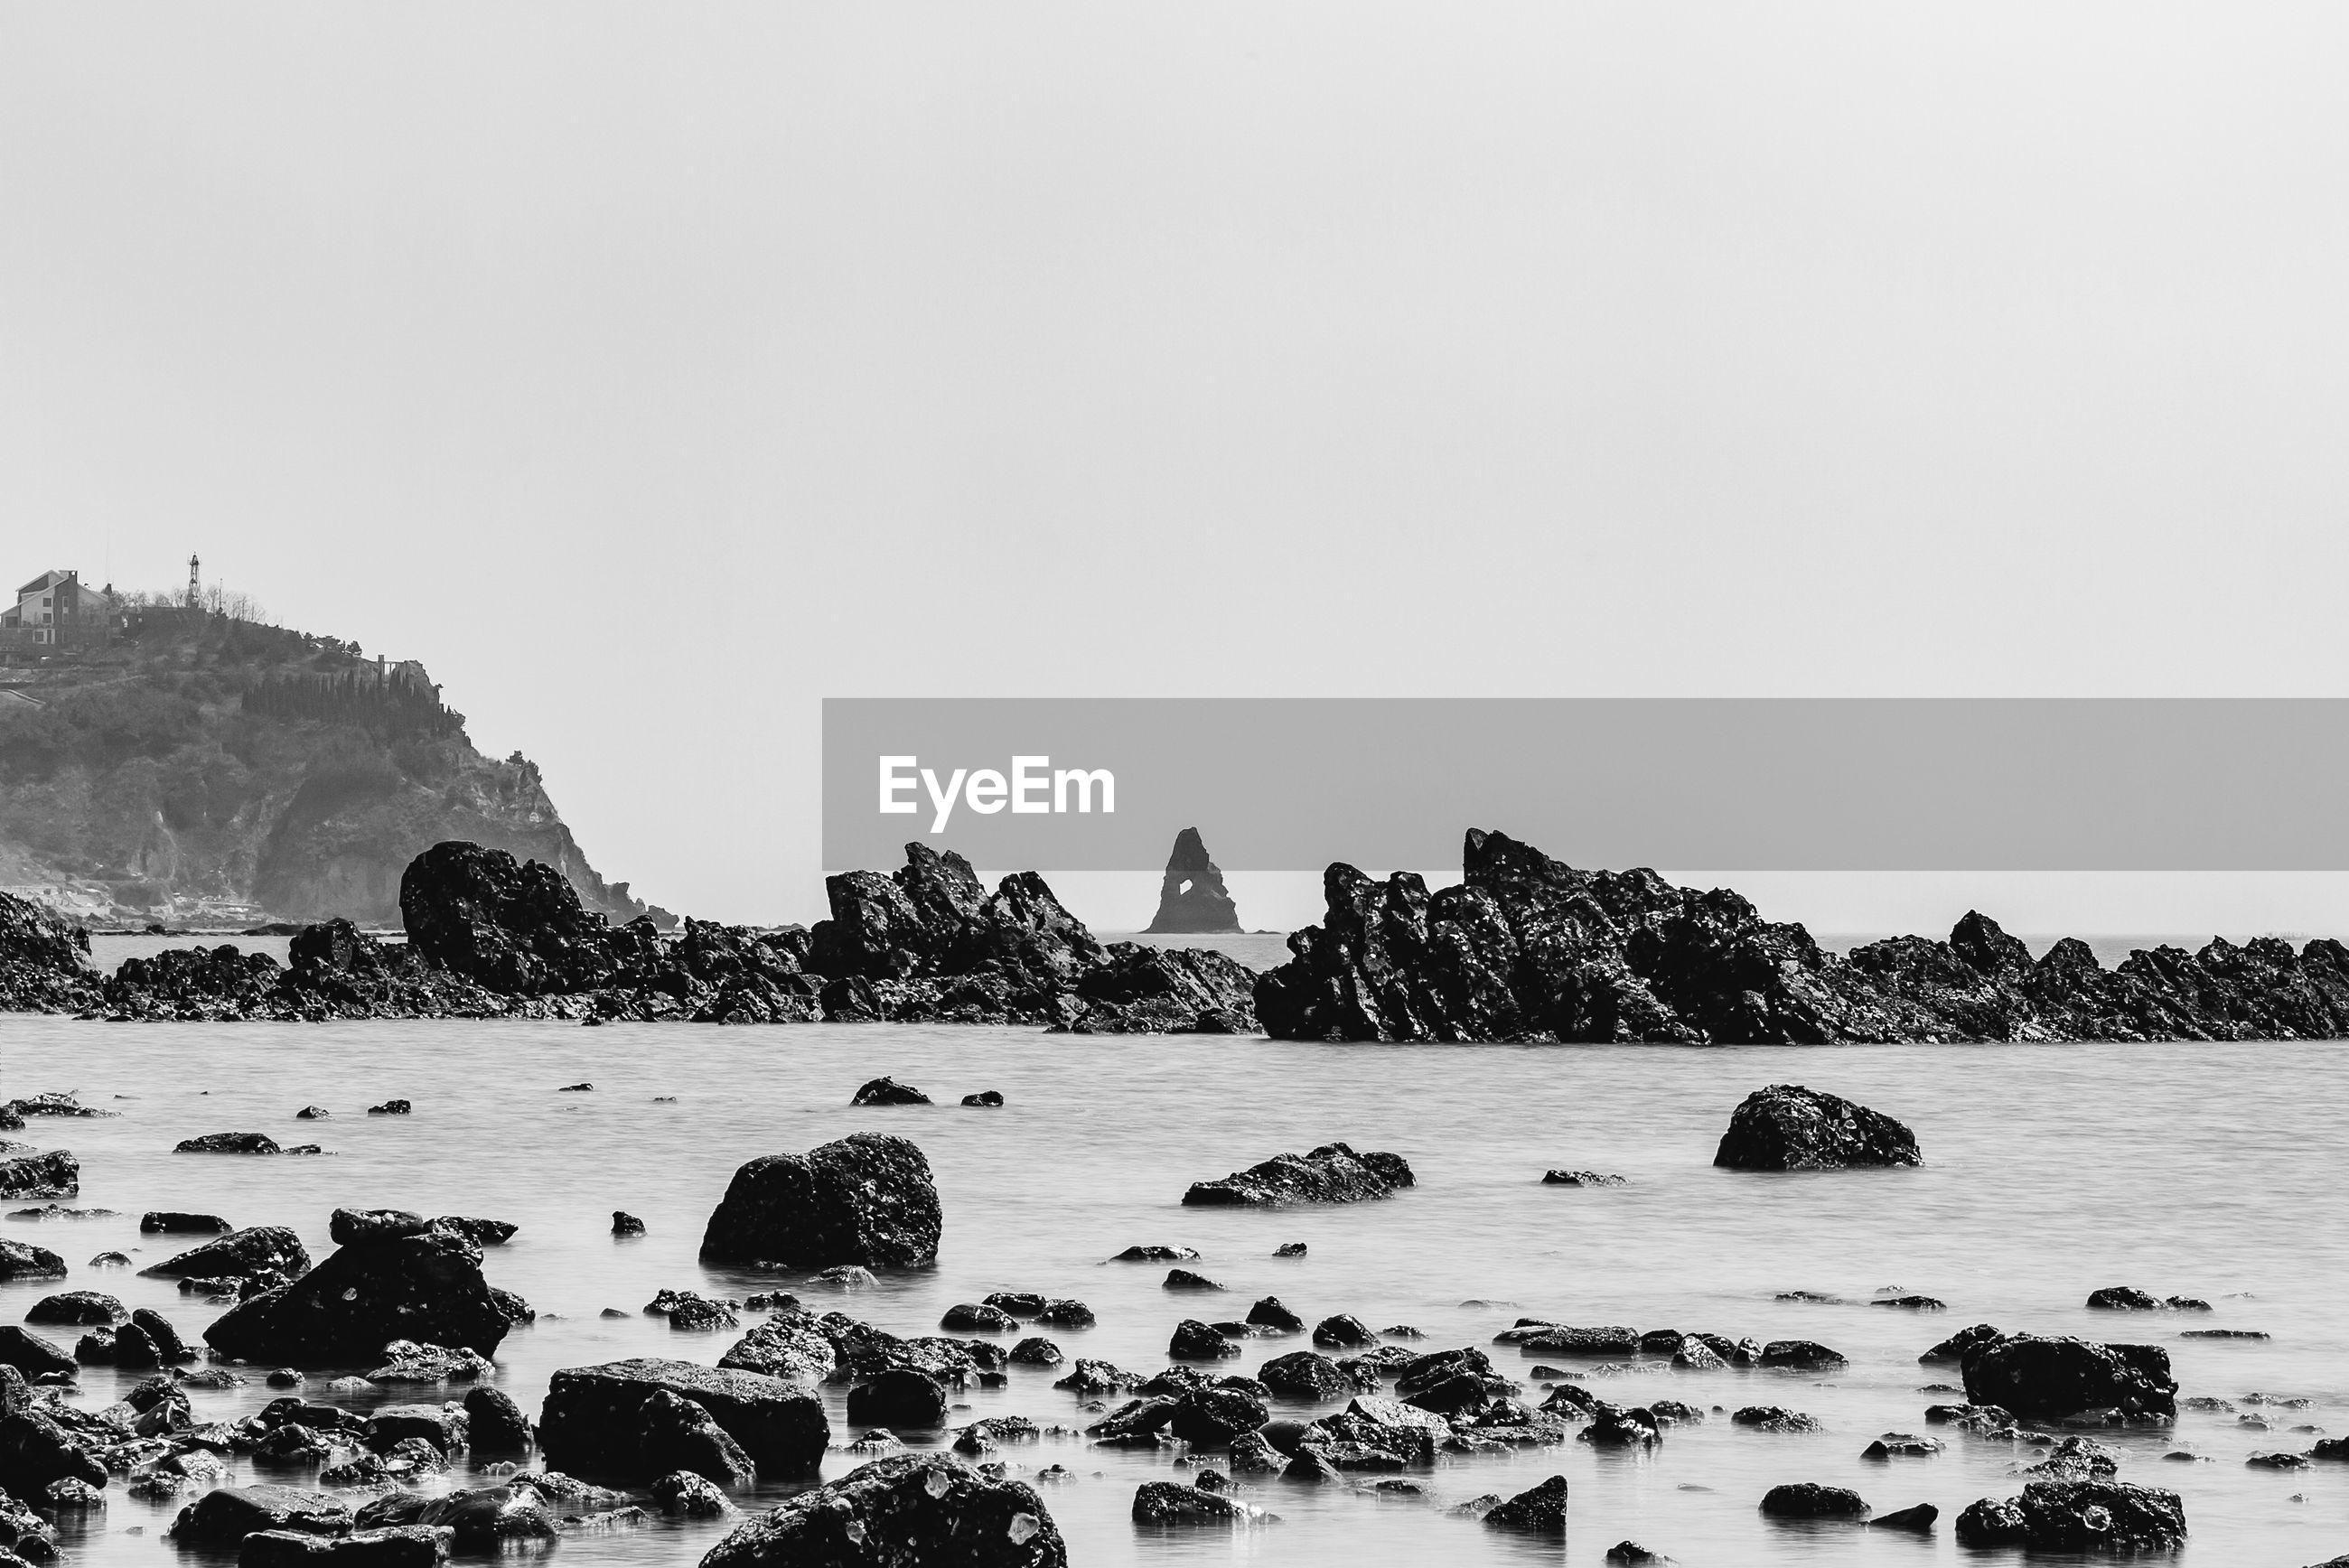 Rocks at seashore against clear sky